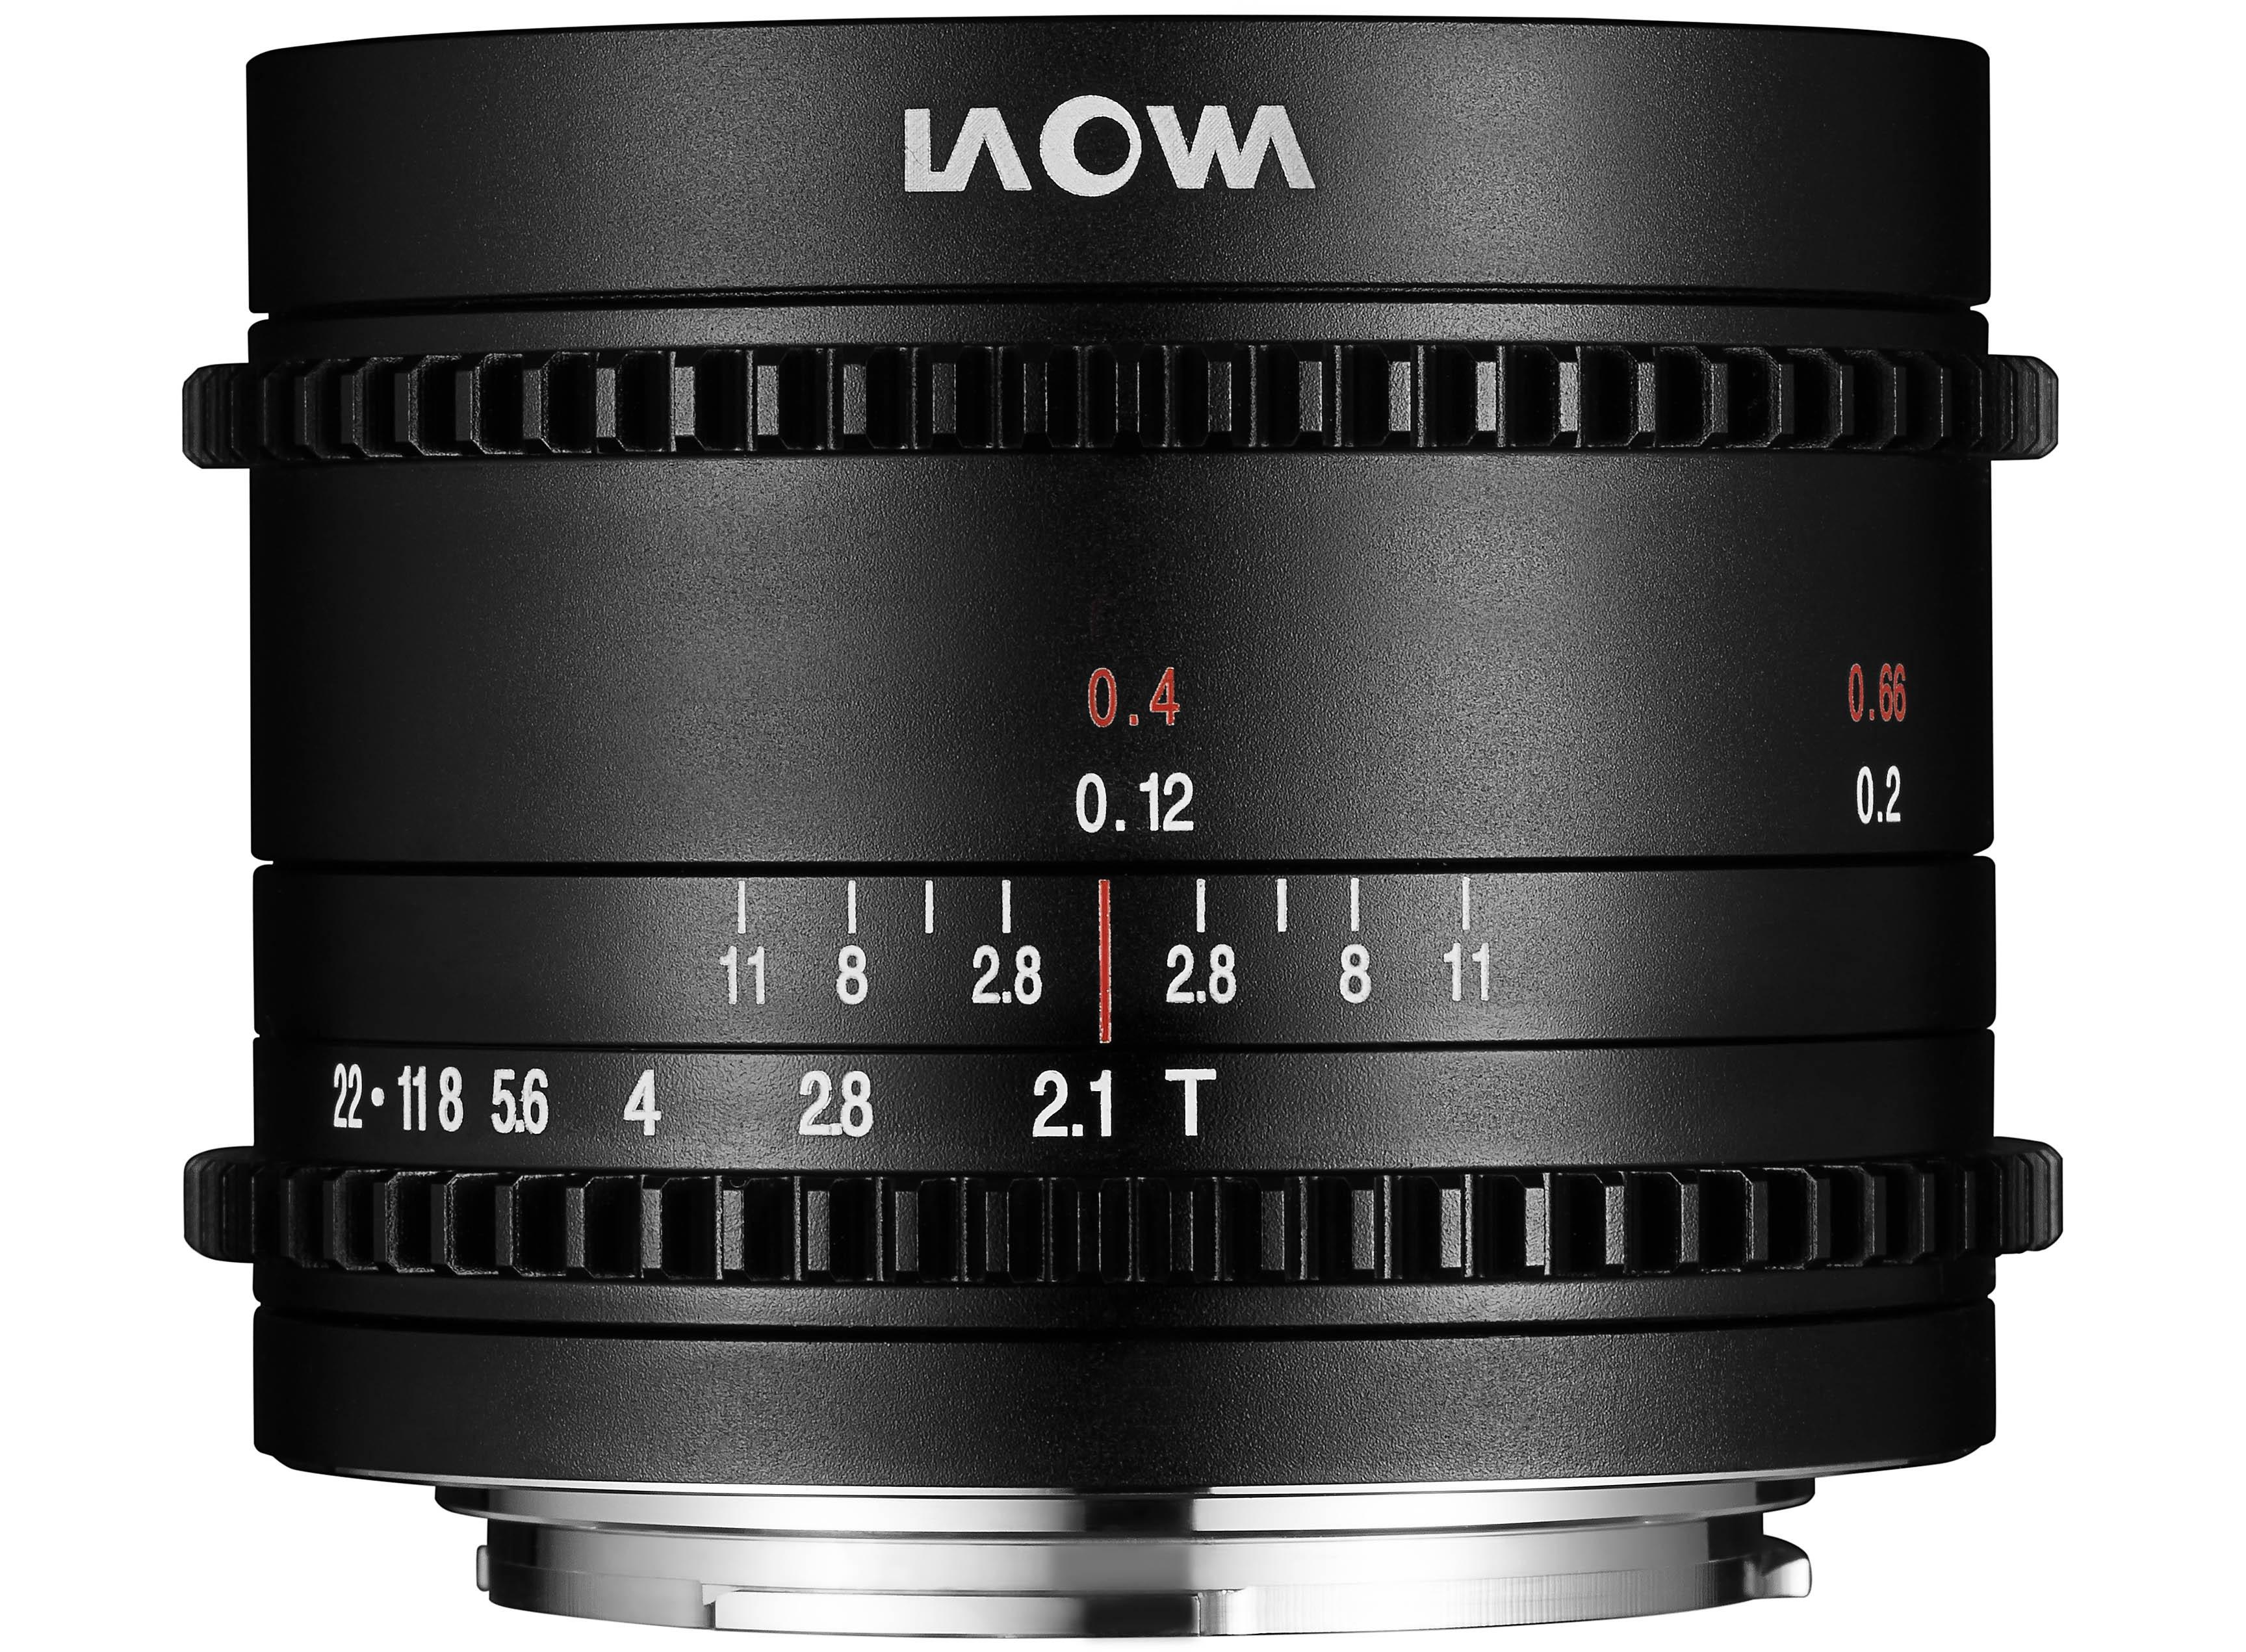 Laowa 7.5mm T2.1 Cine for MFT